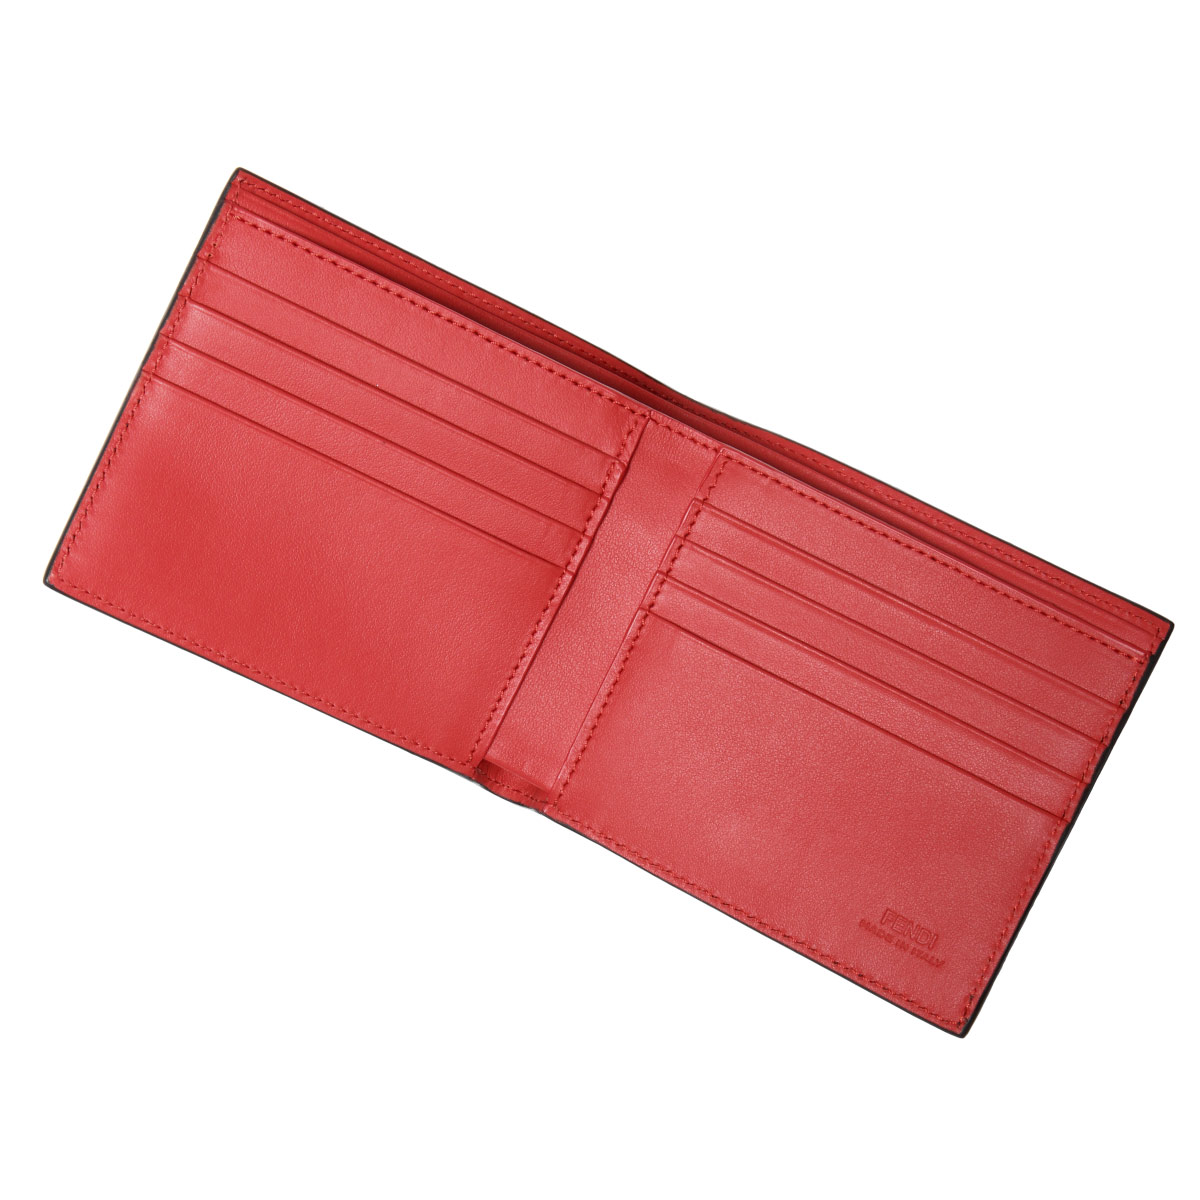 674f628caf7e フェンディFENDI財布メンズ7M0169O73F0U9T二つ折り財布BAGBUGSバッグバグズNERO+GIALLO+ROSSO